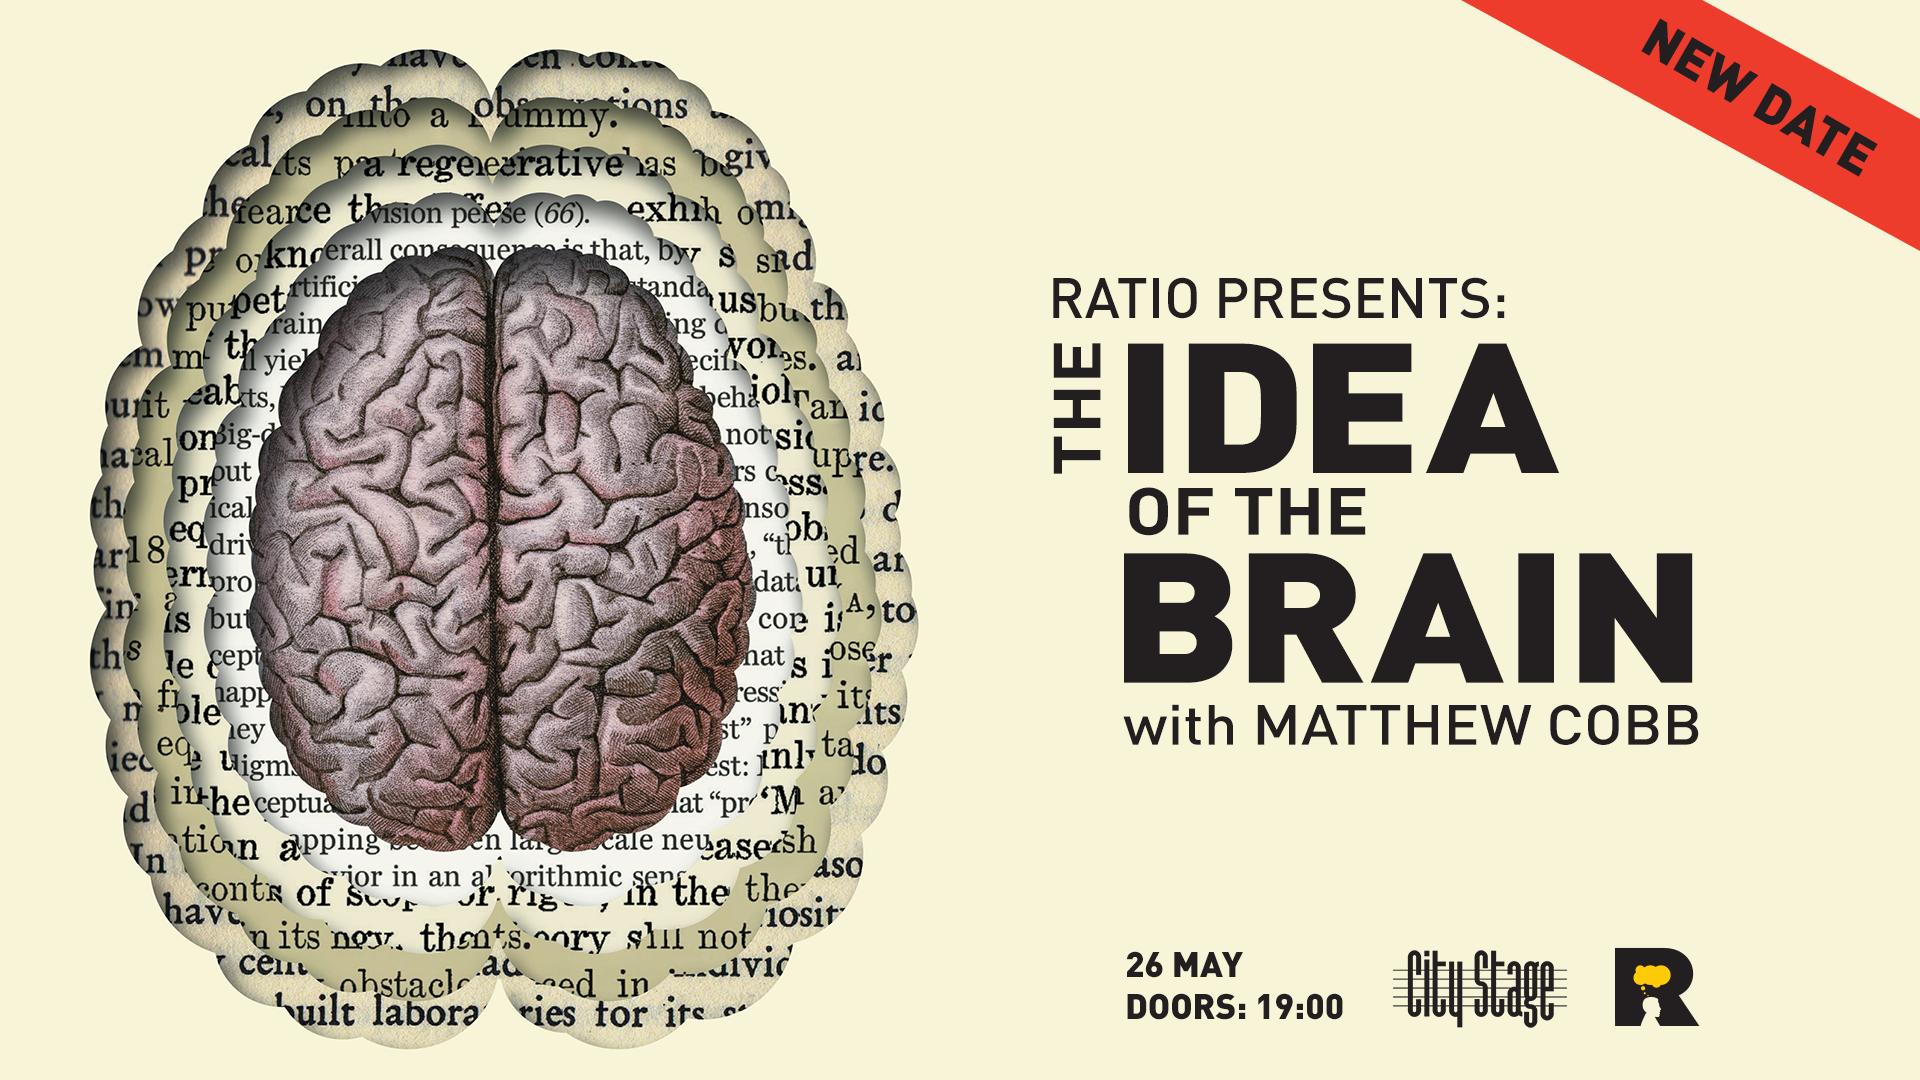 Ratio presents: The Idea of the Brain 26.05